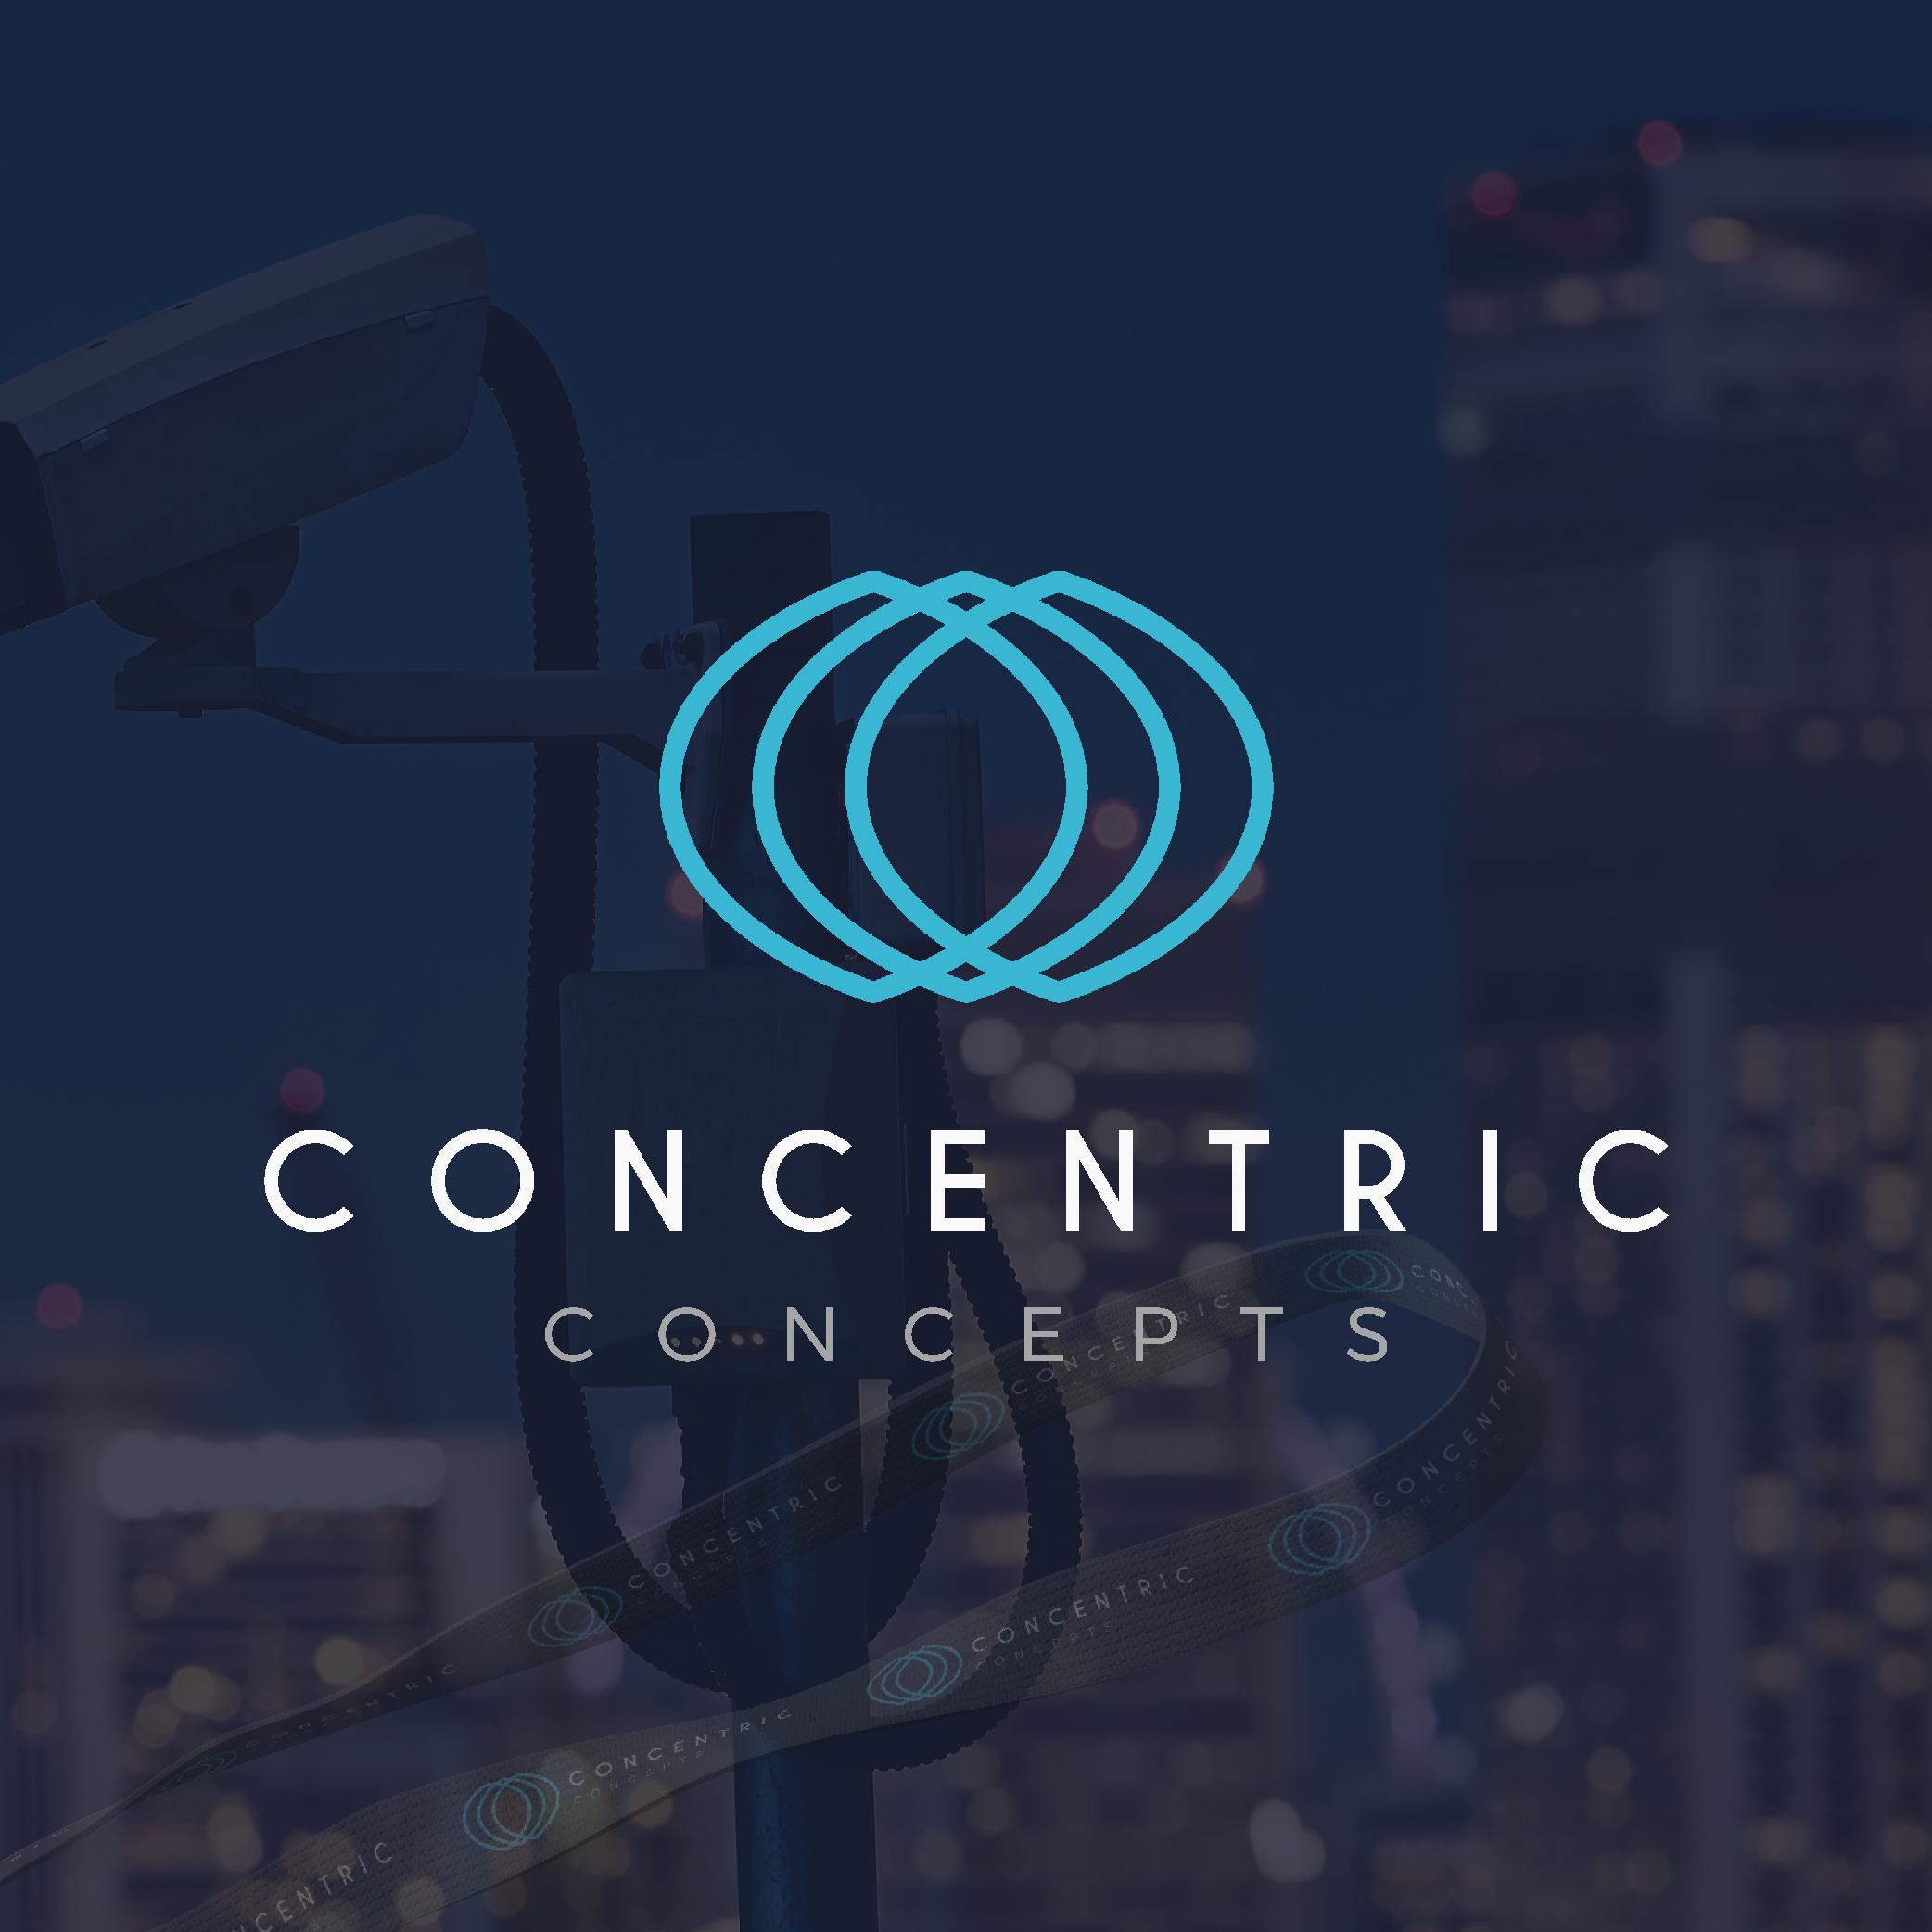 Concentric Concepts